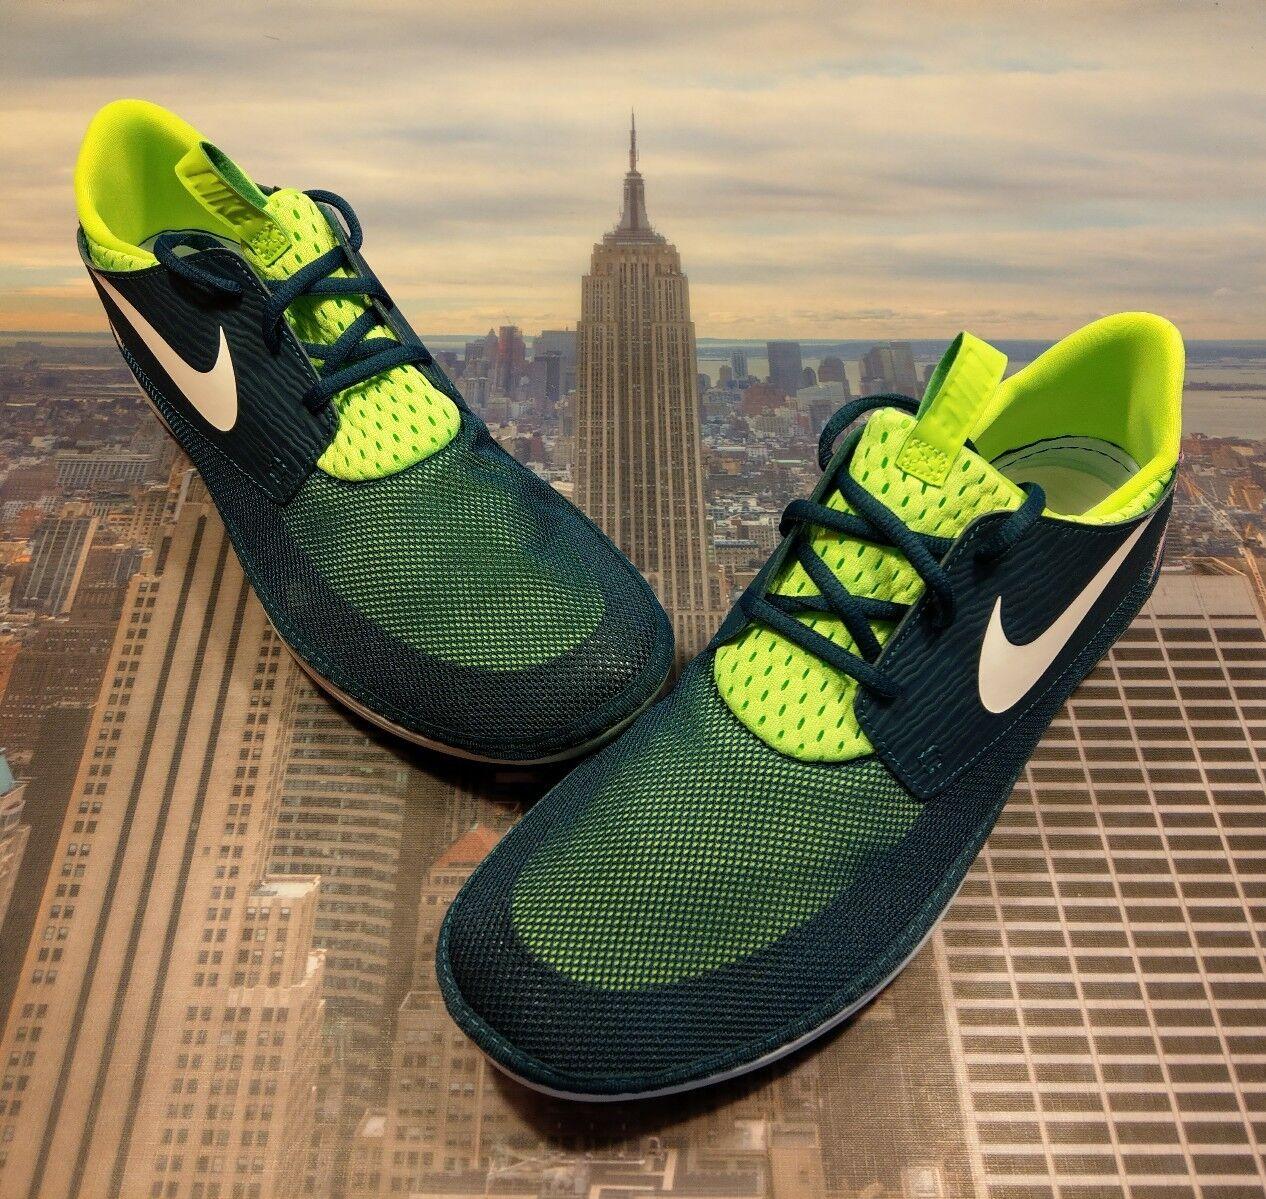 Nike Solarsoft Moccasin Nightshade/White-Blue Men's Size 14 555301 314 New